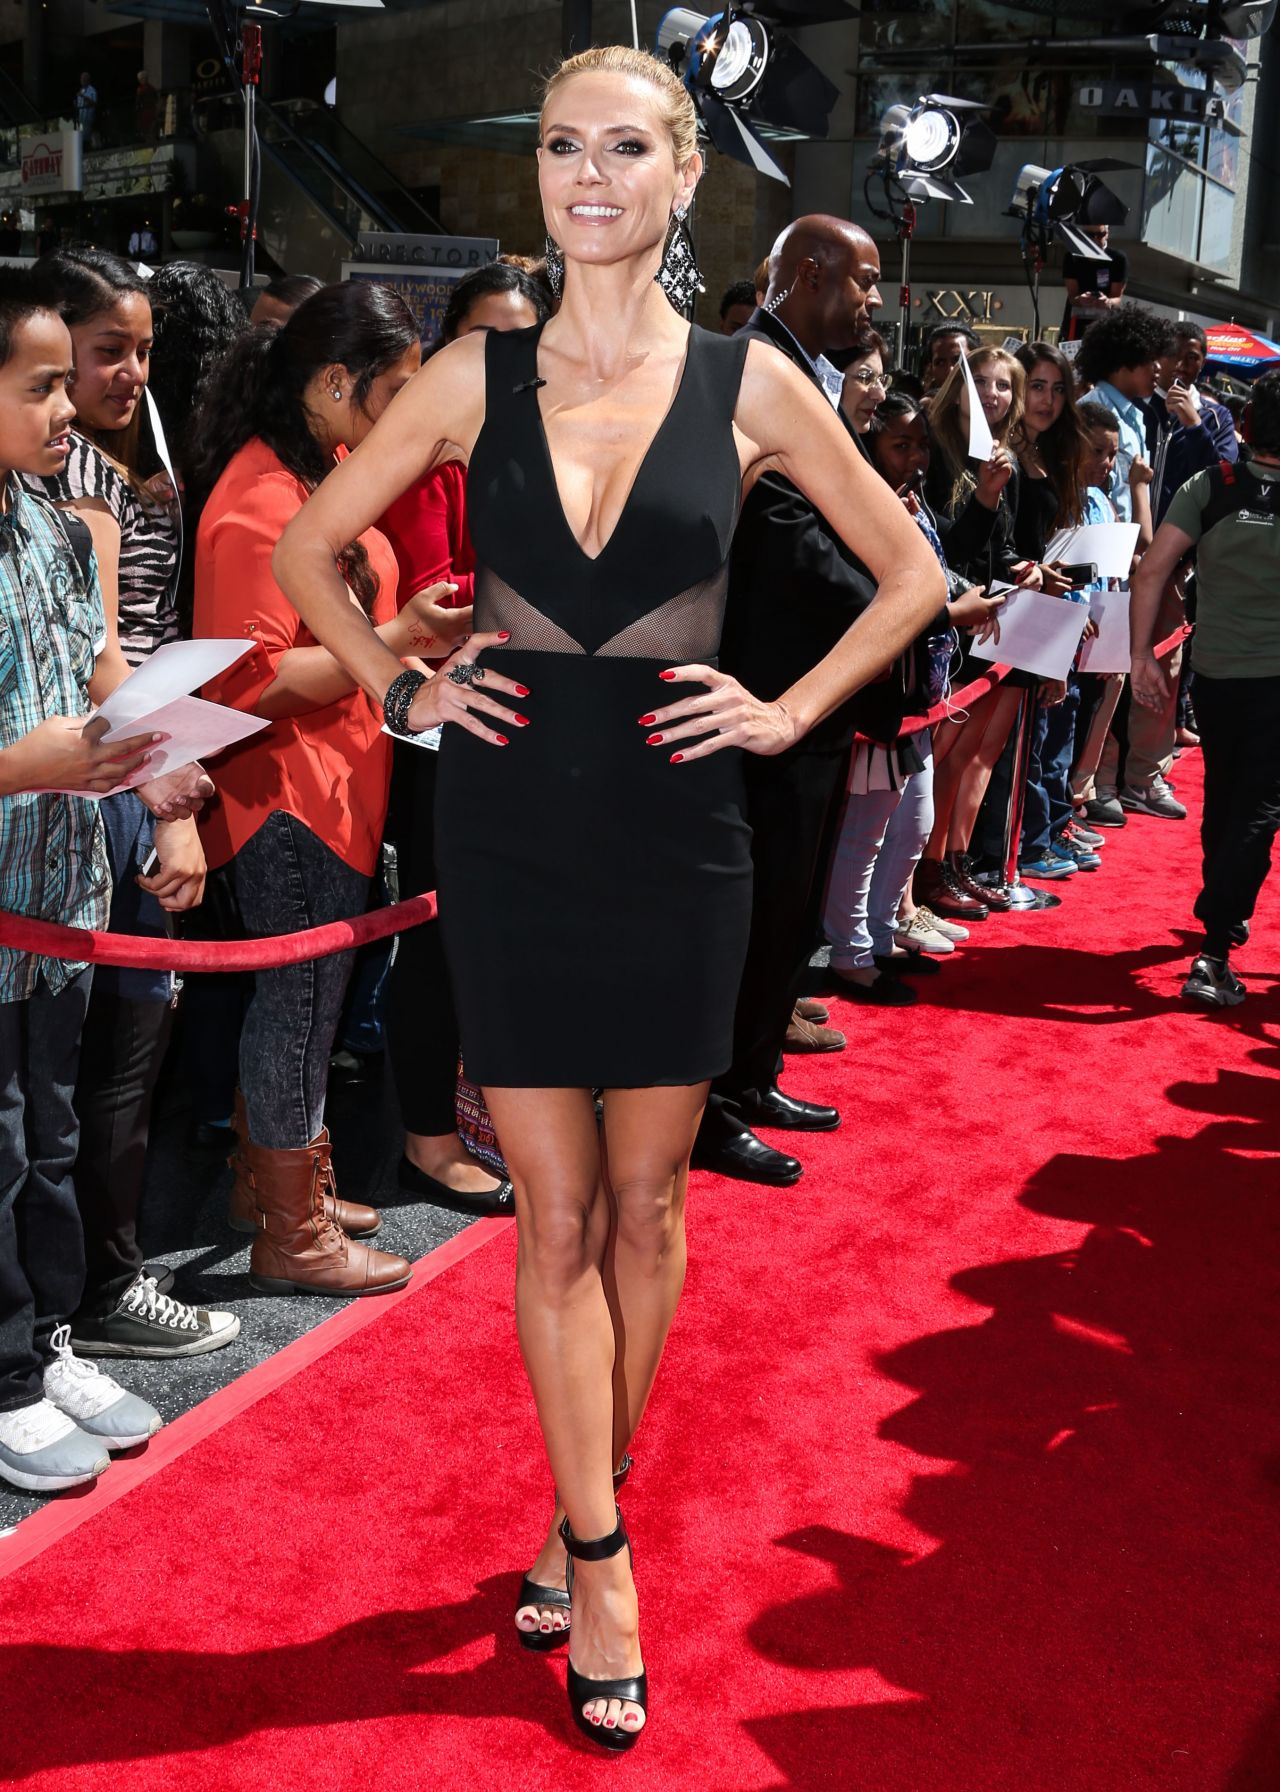 Heidi Klum 39america39s Got Talent39 Season 10 Red Carpet